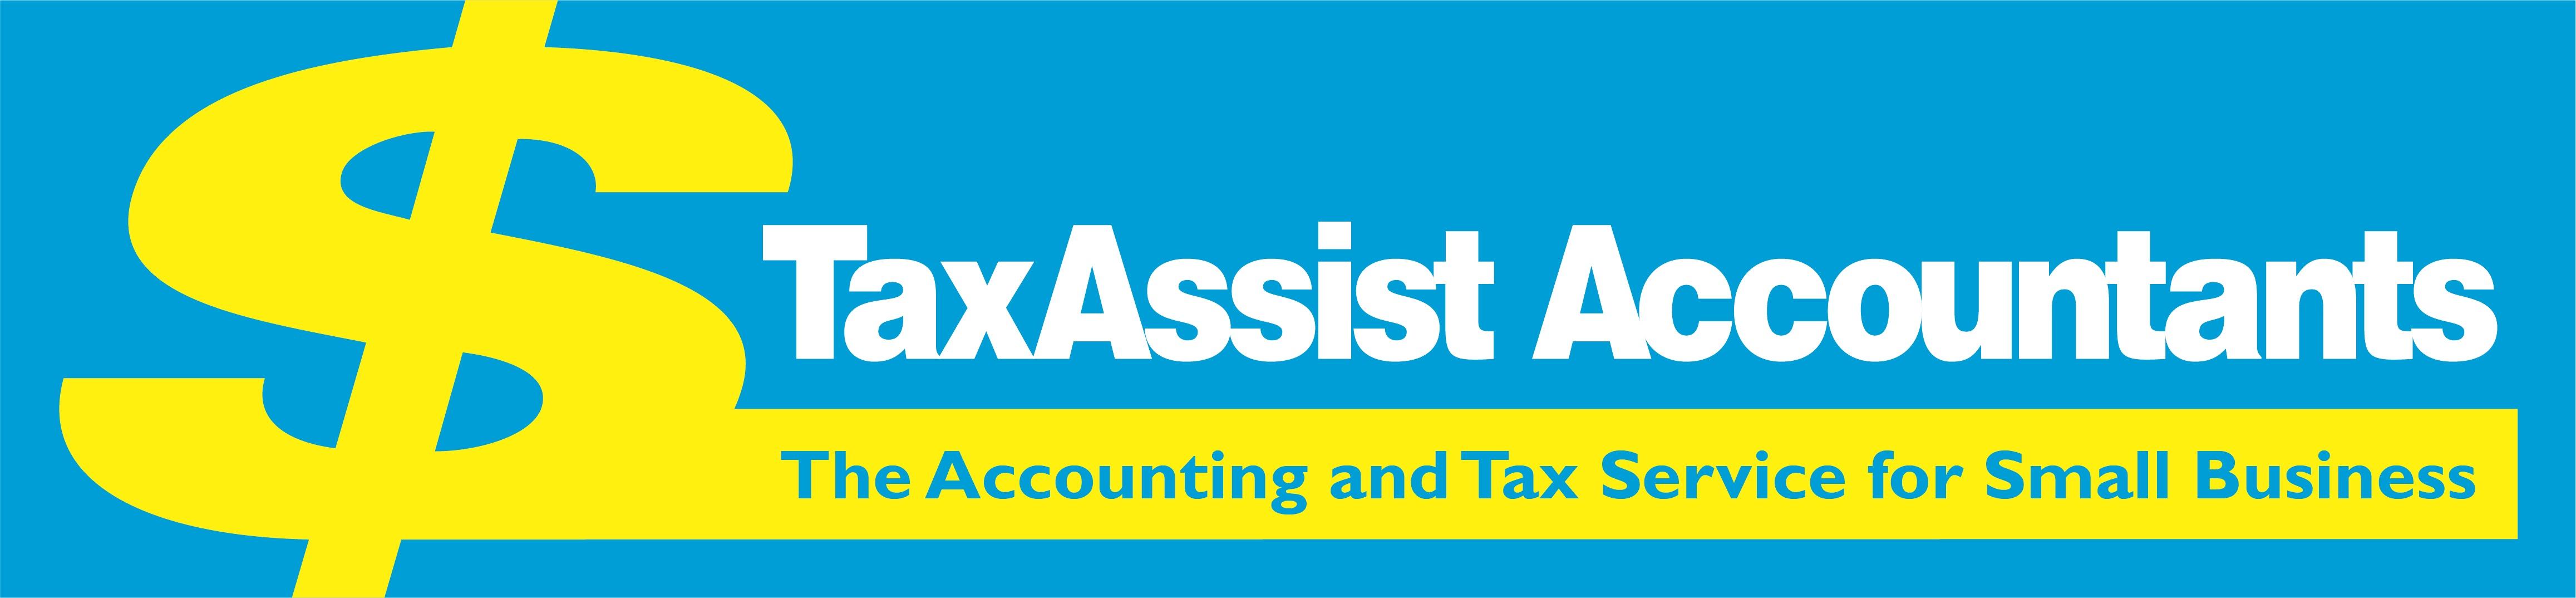 TaxAssist Accountants Logo